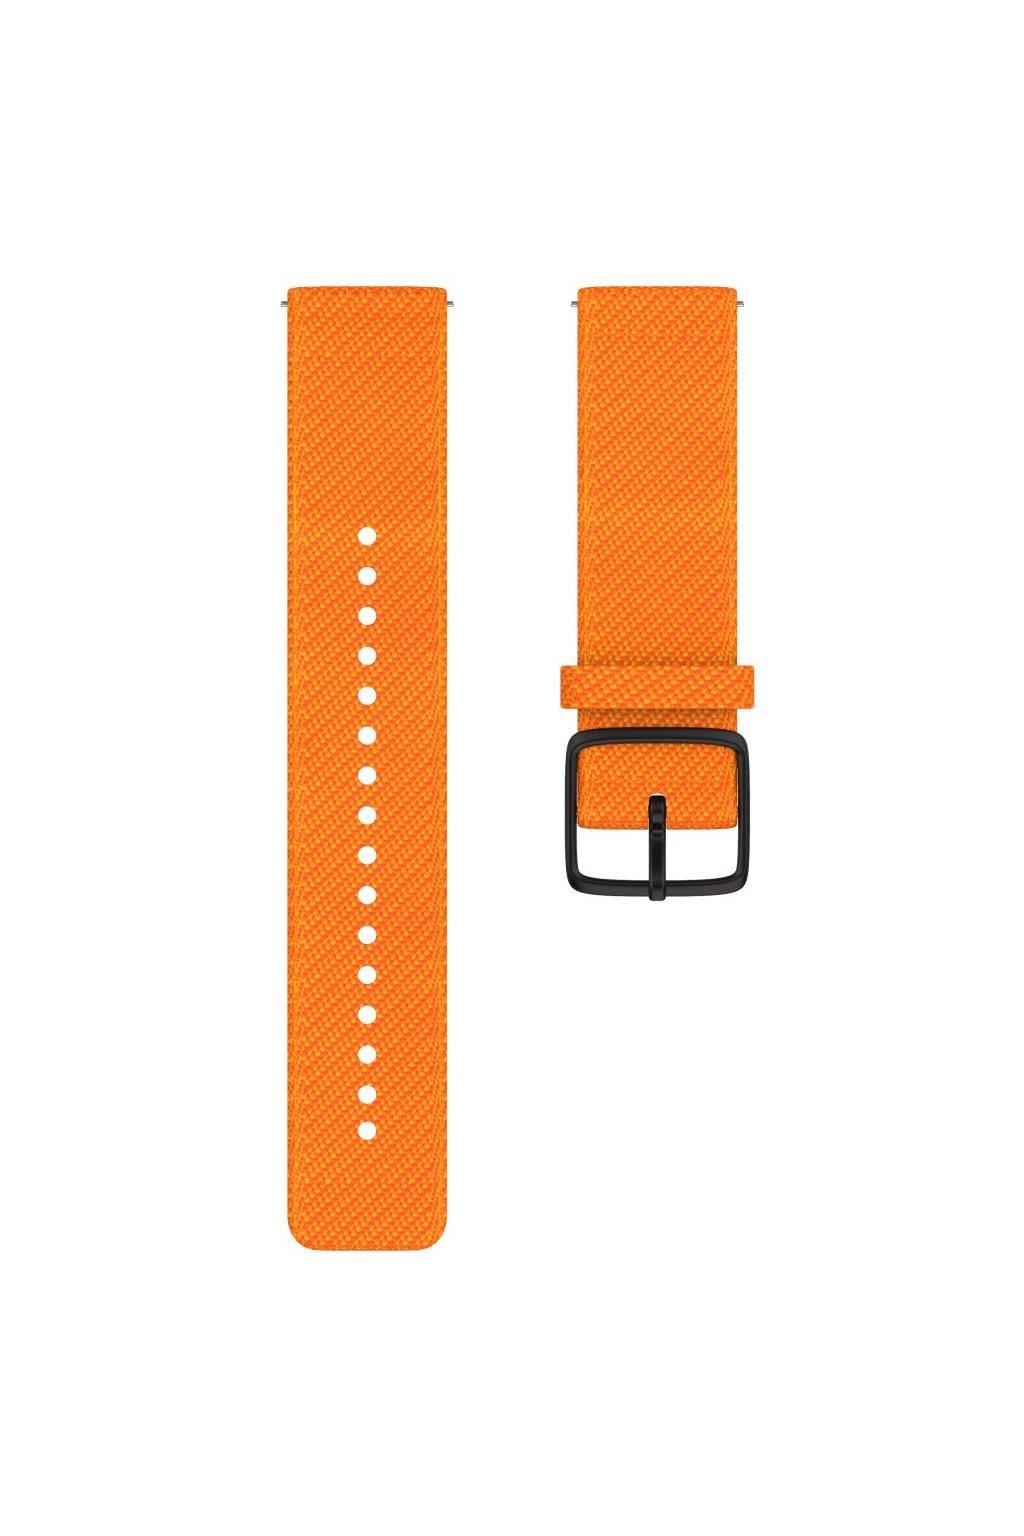 Vantage M accessory woven wristband front orange